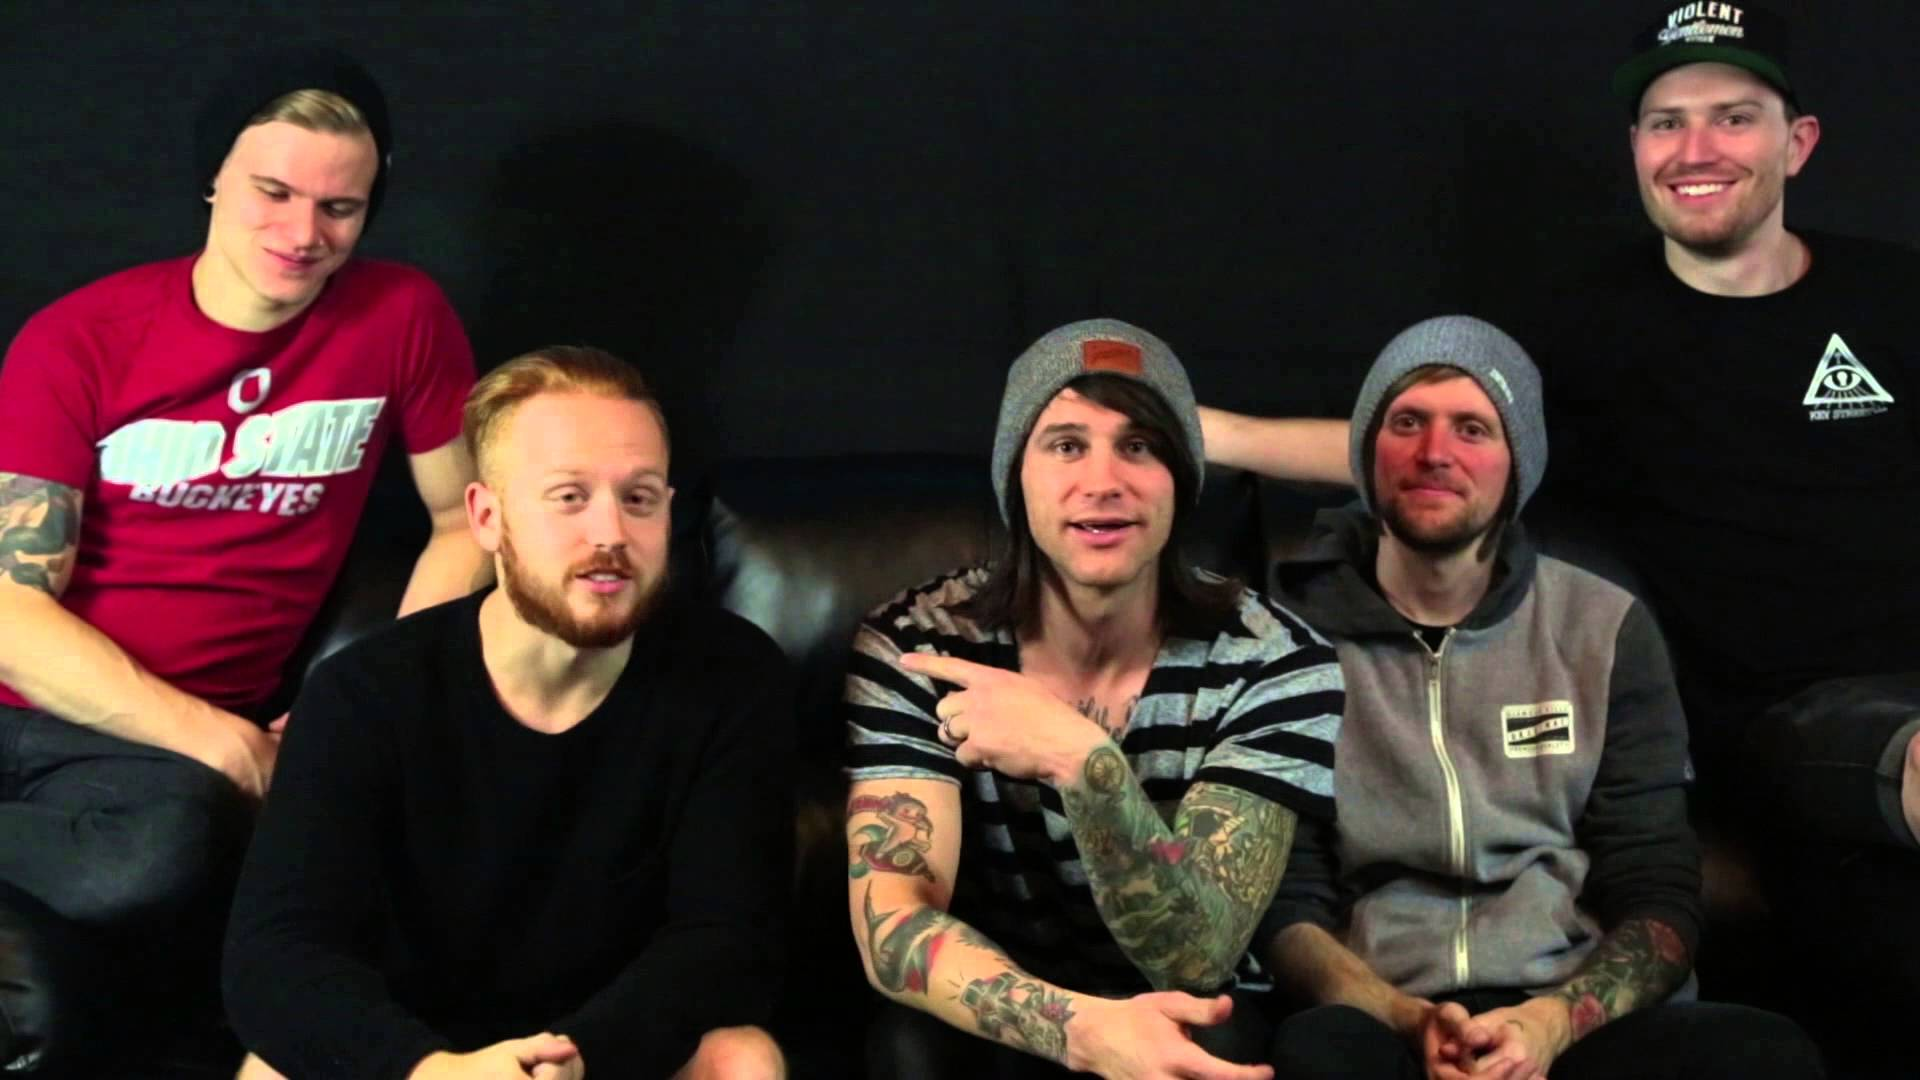 Blessthefall - Vans Warped Tour 2015 Announcement